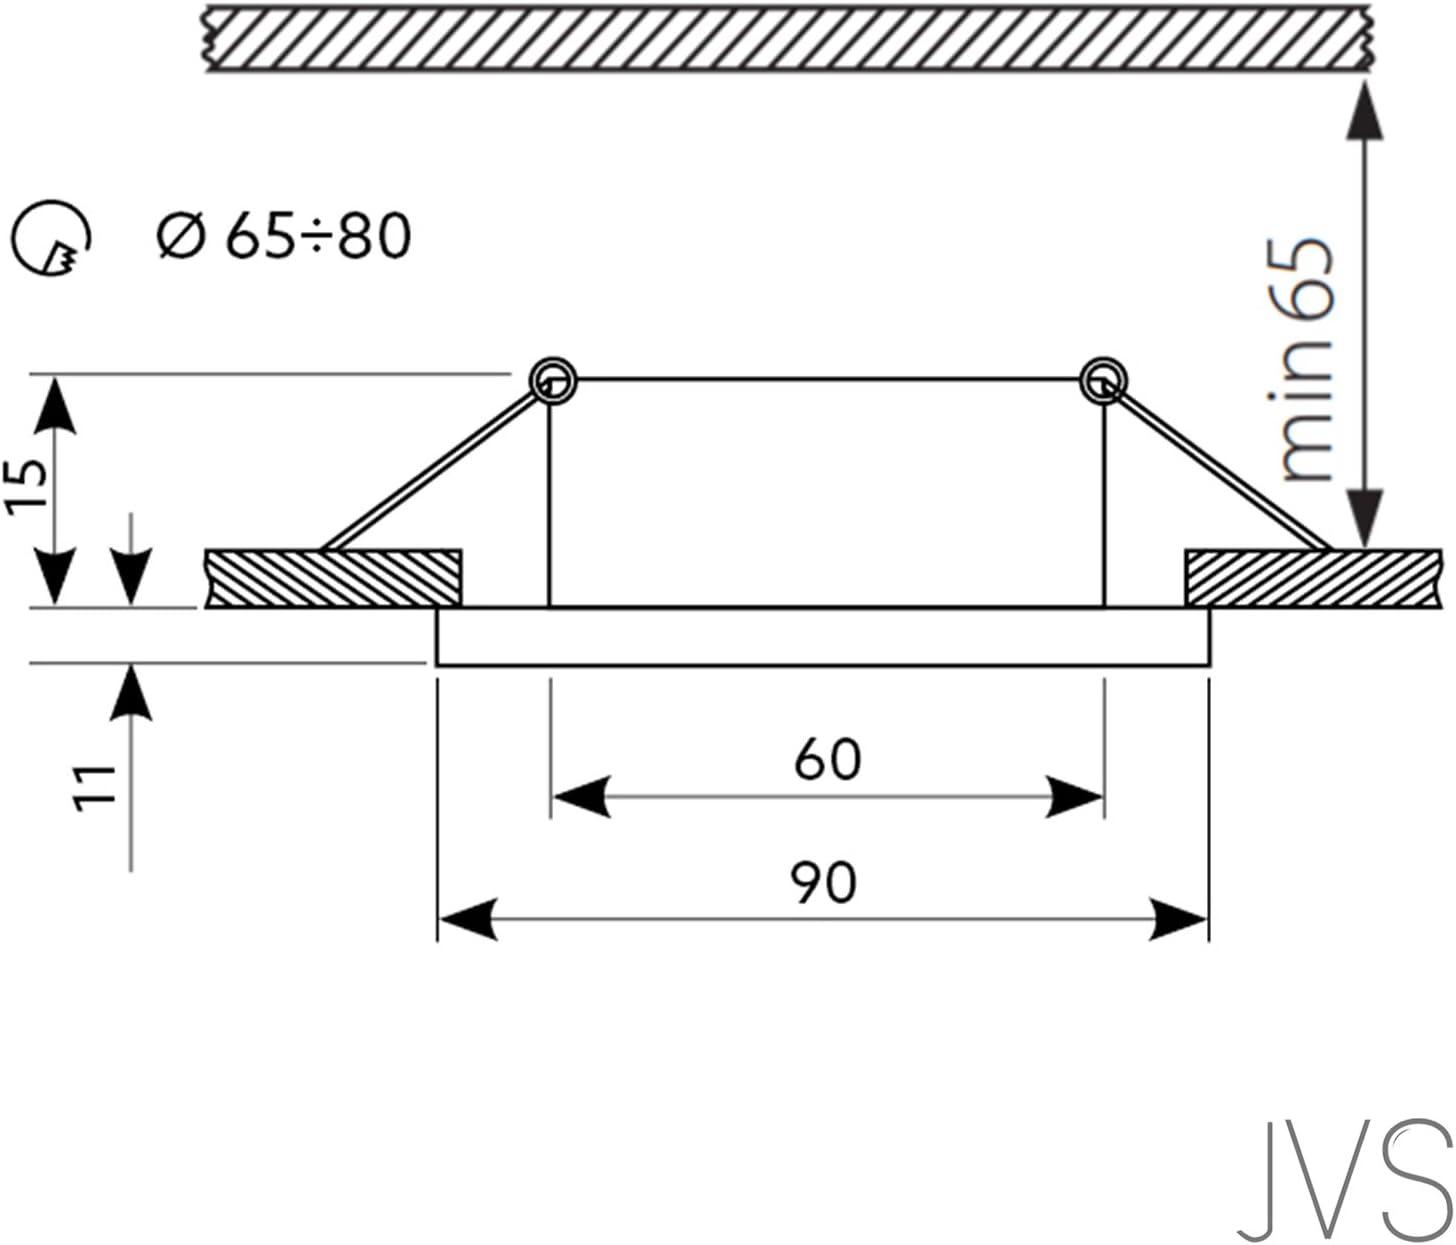 LED Einbaustrahler aus Glas/Spiegel/Schwarz CRISTAL Eckig Inkl. 6 X 7W LED Warmweiss 230V IP20 LED Deckenstrahler Einbauleuchte Deckeneinbaustrahler Einbauspot Deckeneinbauleuchte Deckenspot 1 Stück